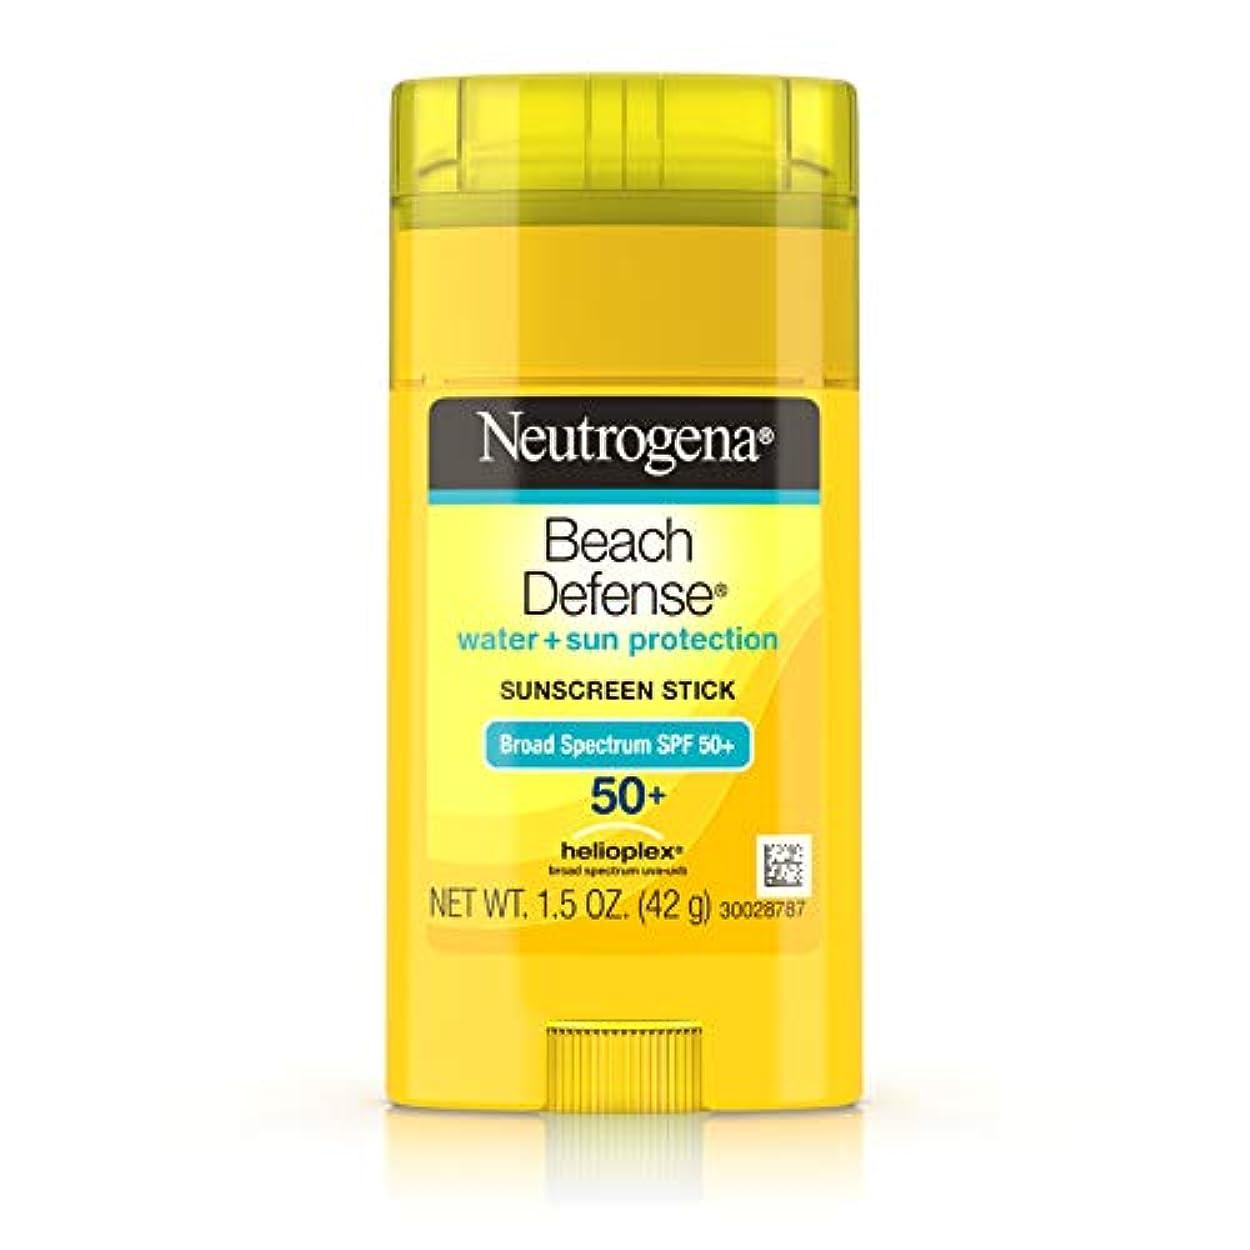 保有者木曜日フルーティーNeutrogena Sunscreen Beach Defense Sunblock Stick SPF 50, 1.5 Ounce